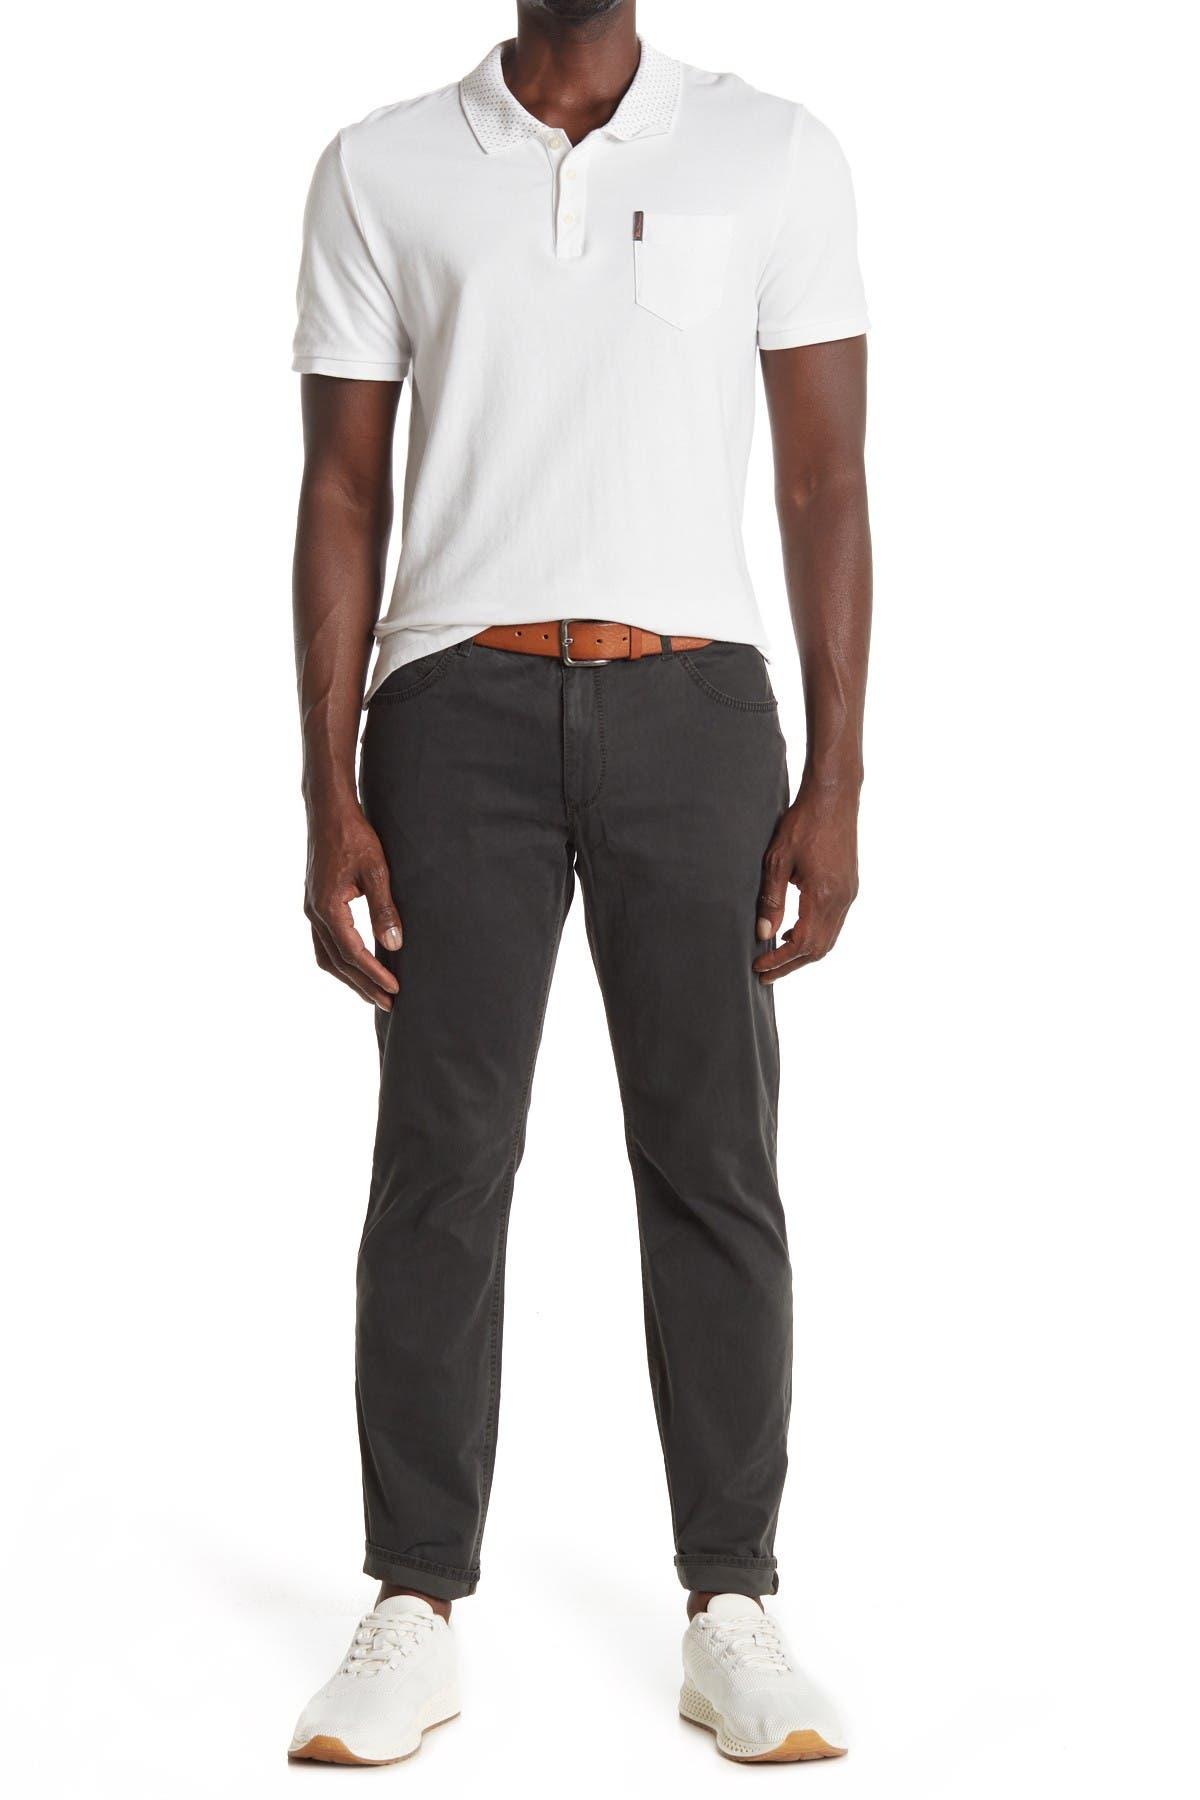 "Image of Brax Solid 5-Pocket Pants - 34"" Inseam"